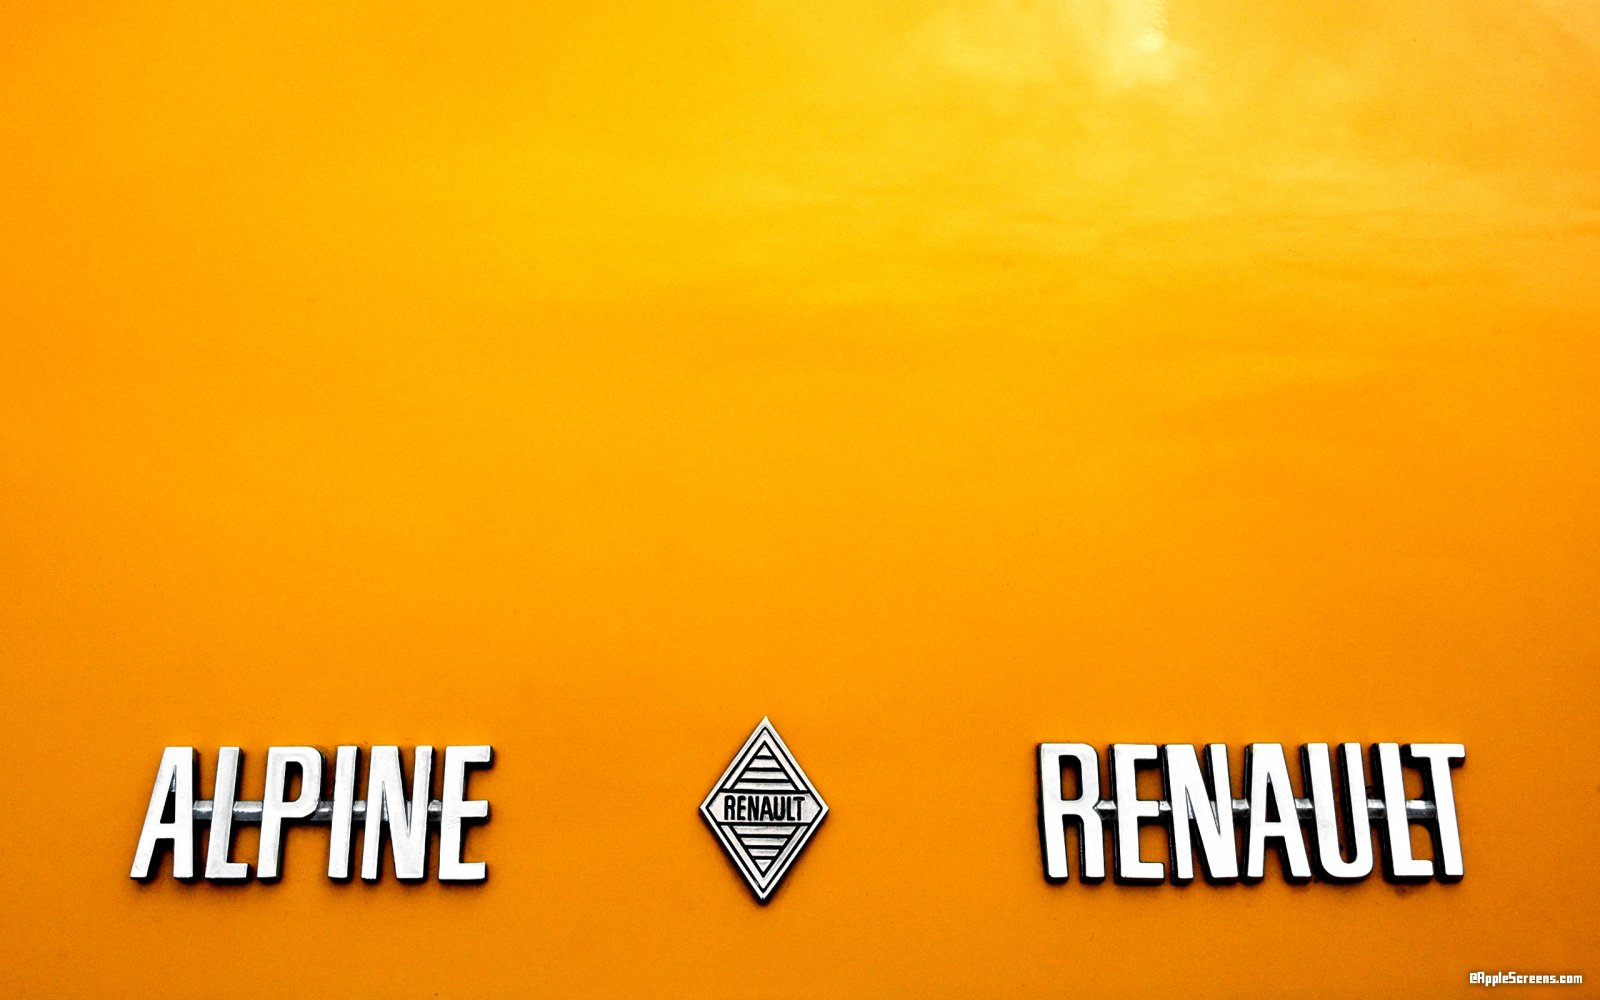 fond d'écran alpine renault.jpg